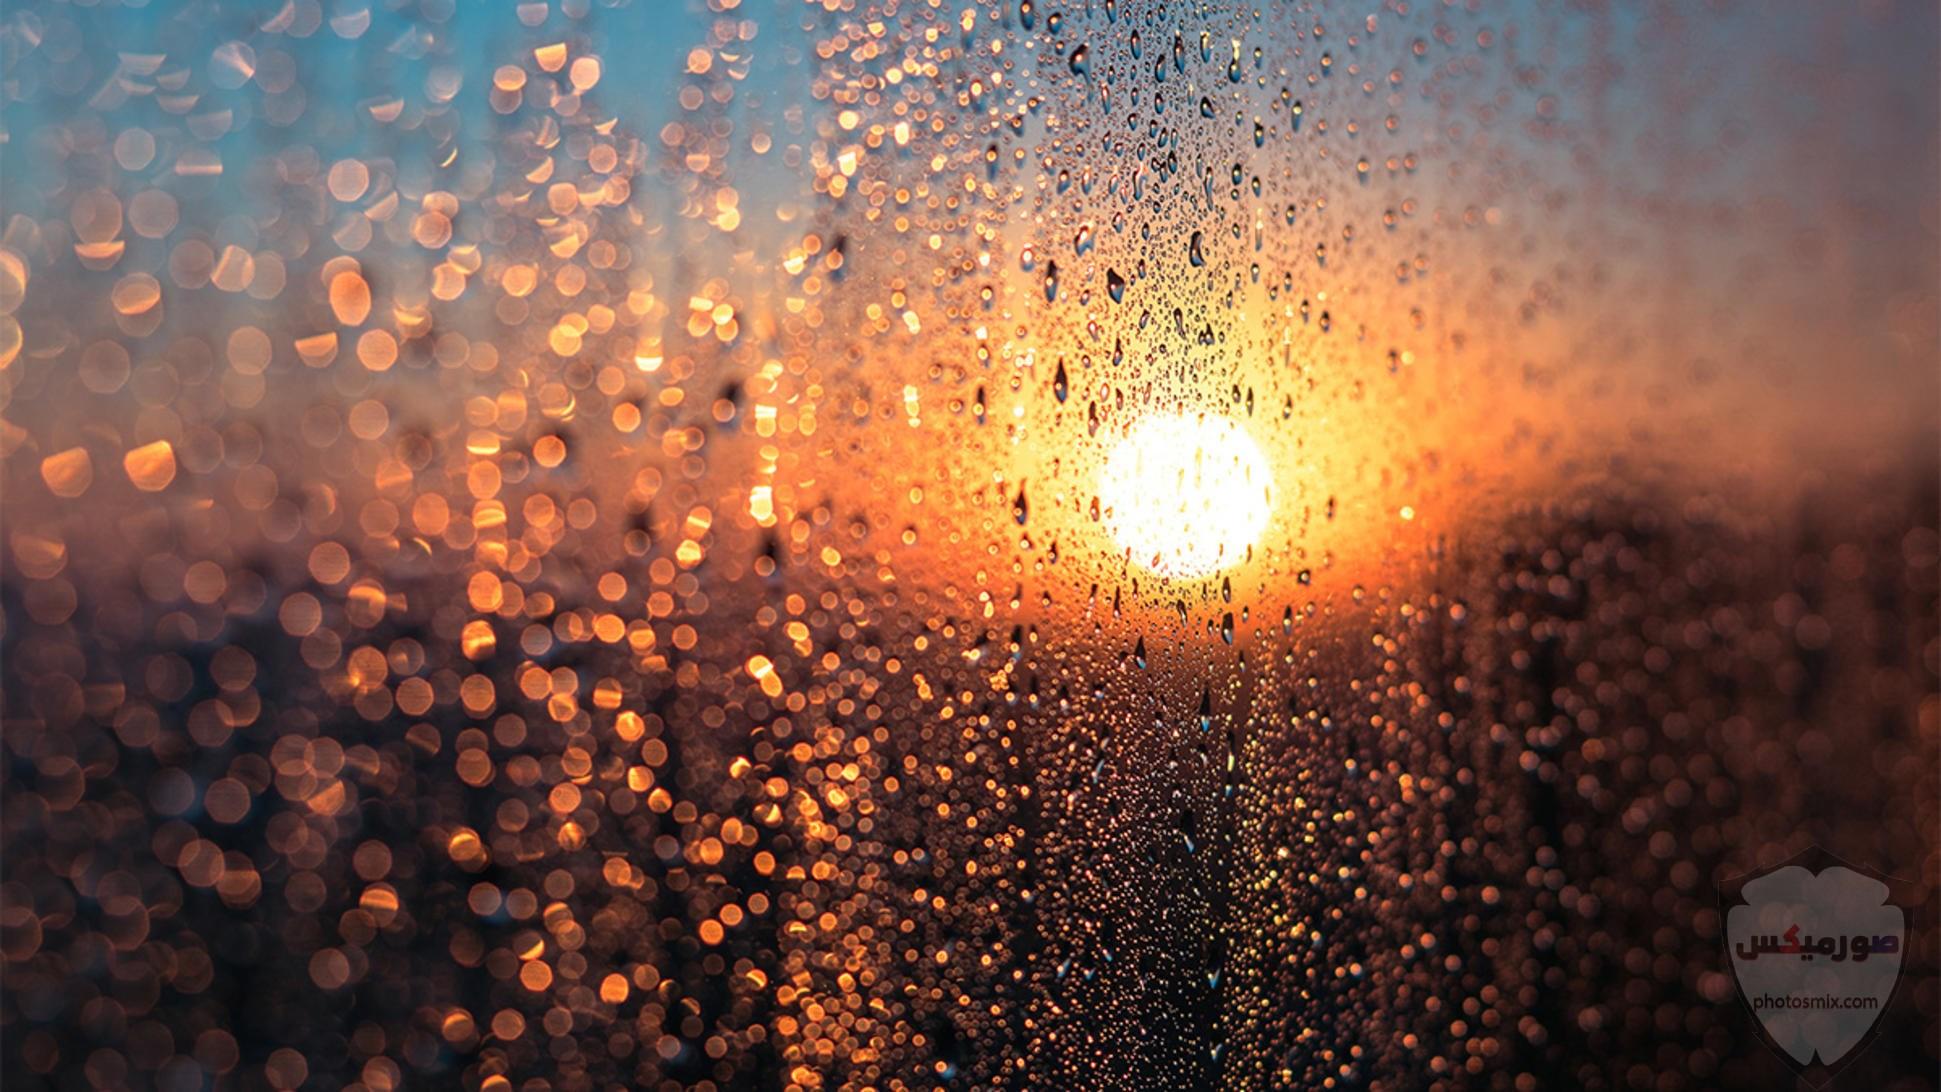 صور مطر جديدة 2020 photos rain خلفيات مطر 7 1